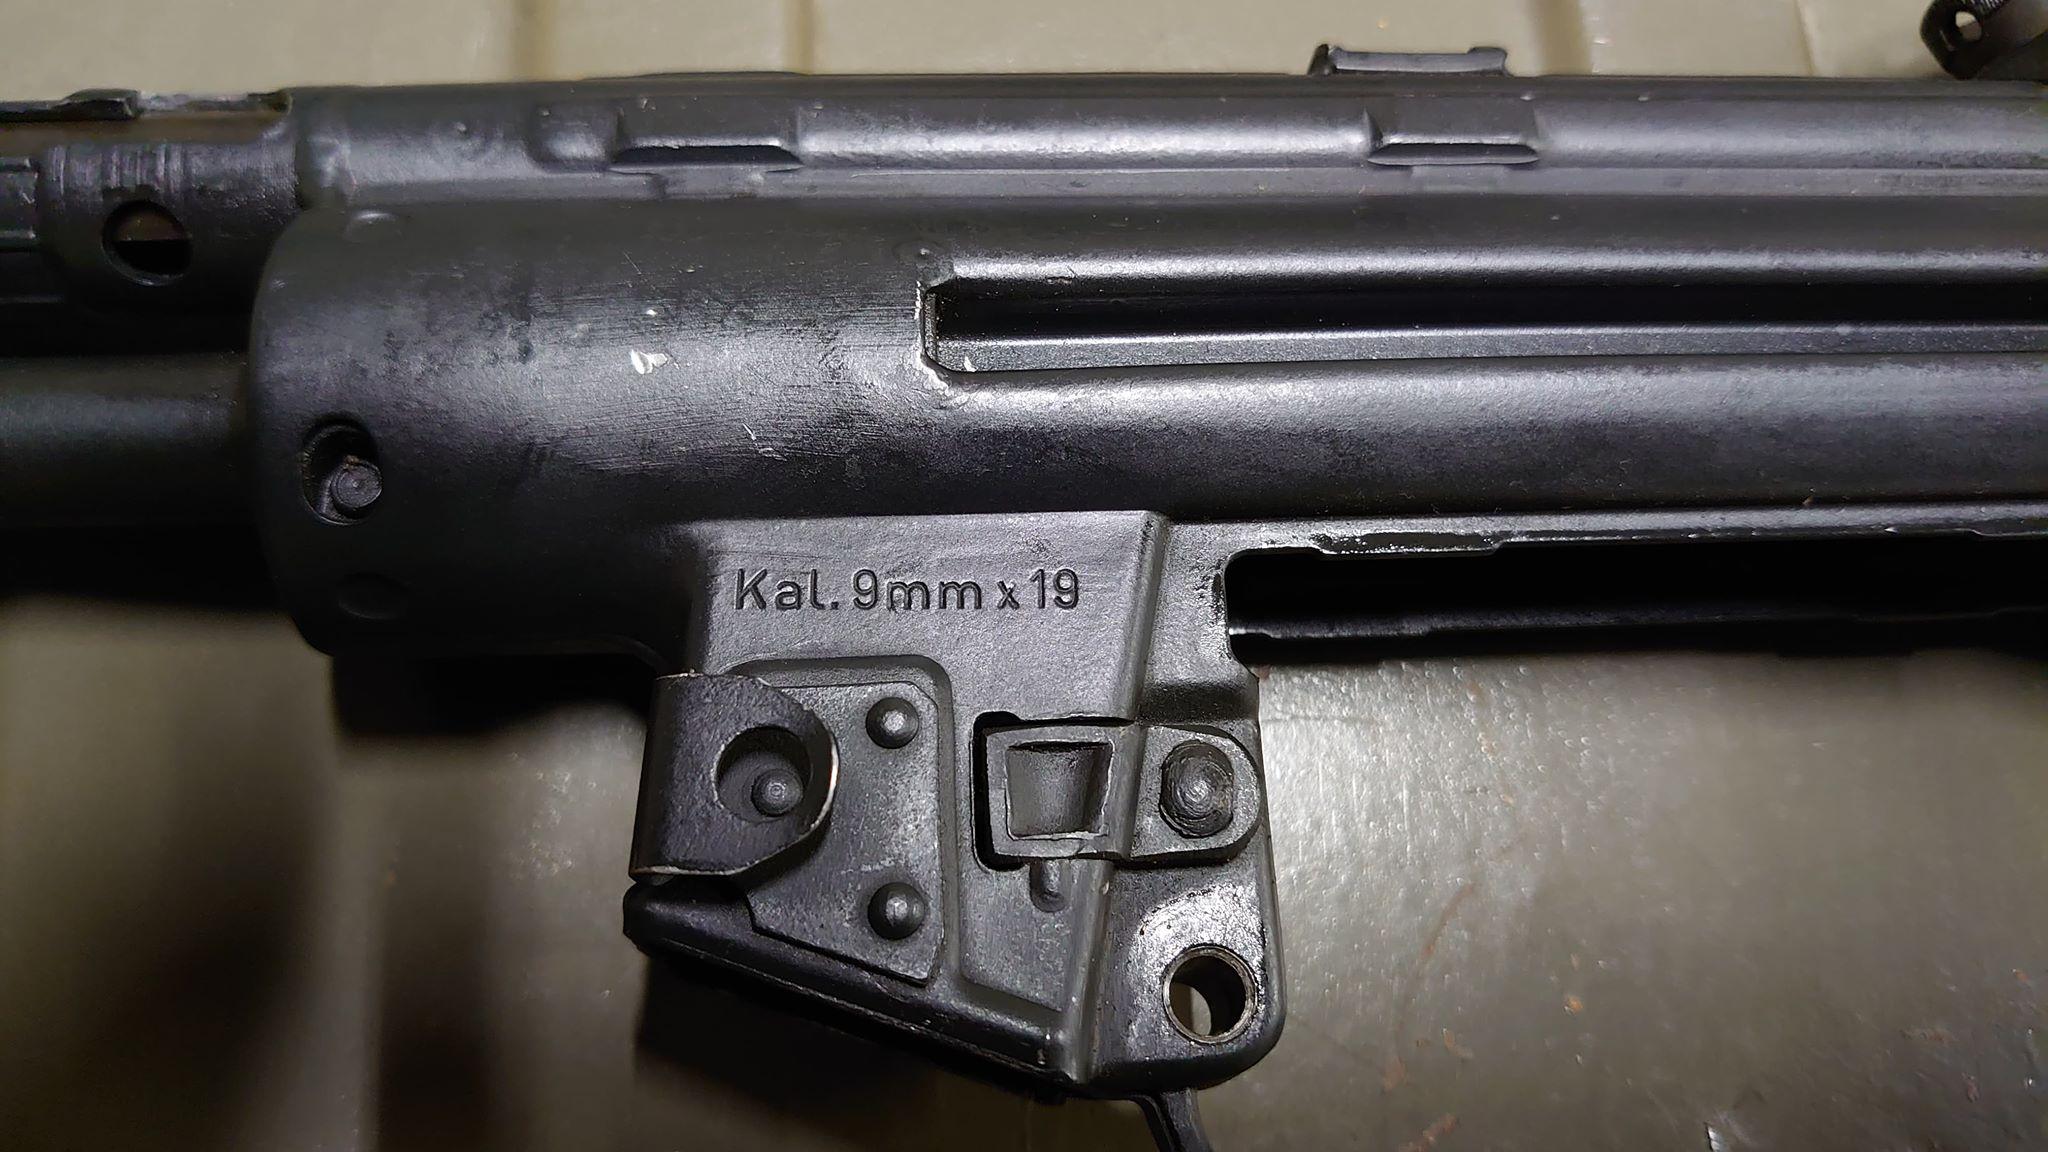 Strange MP5 Clone-05.jpg